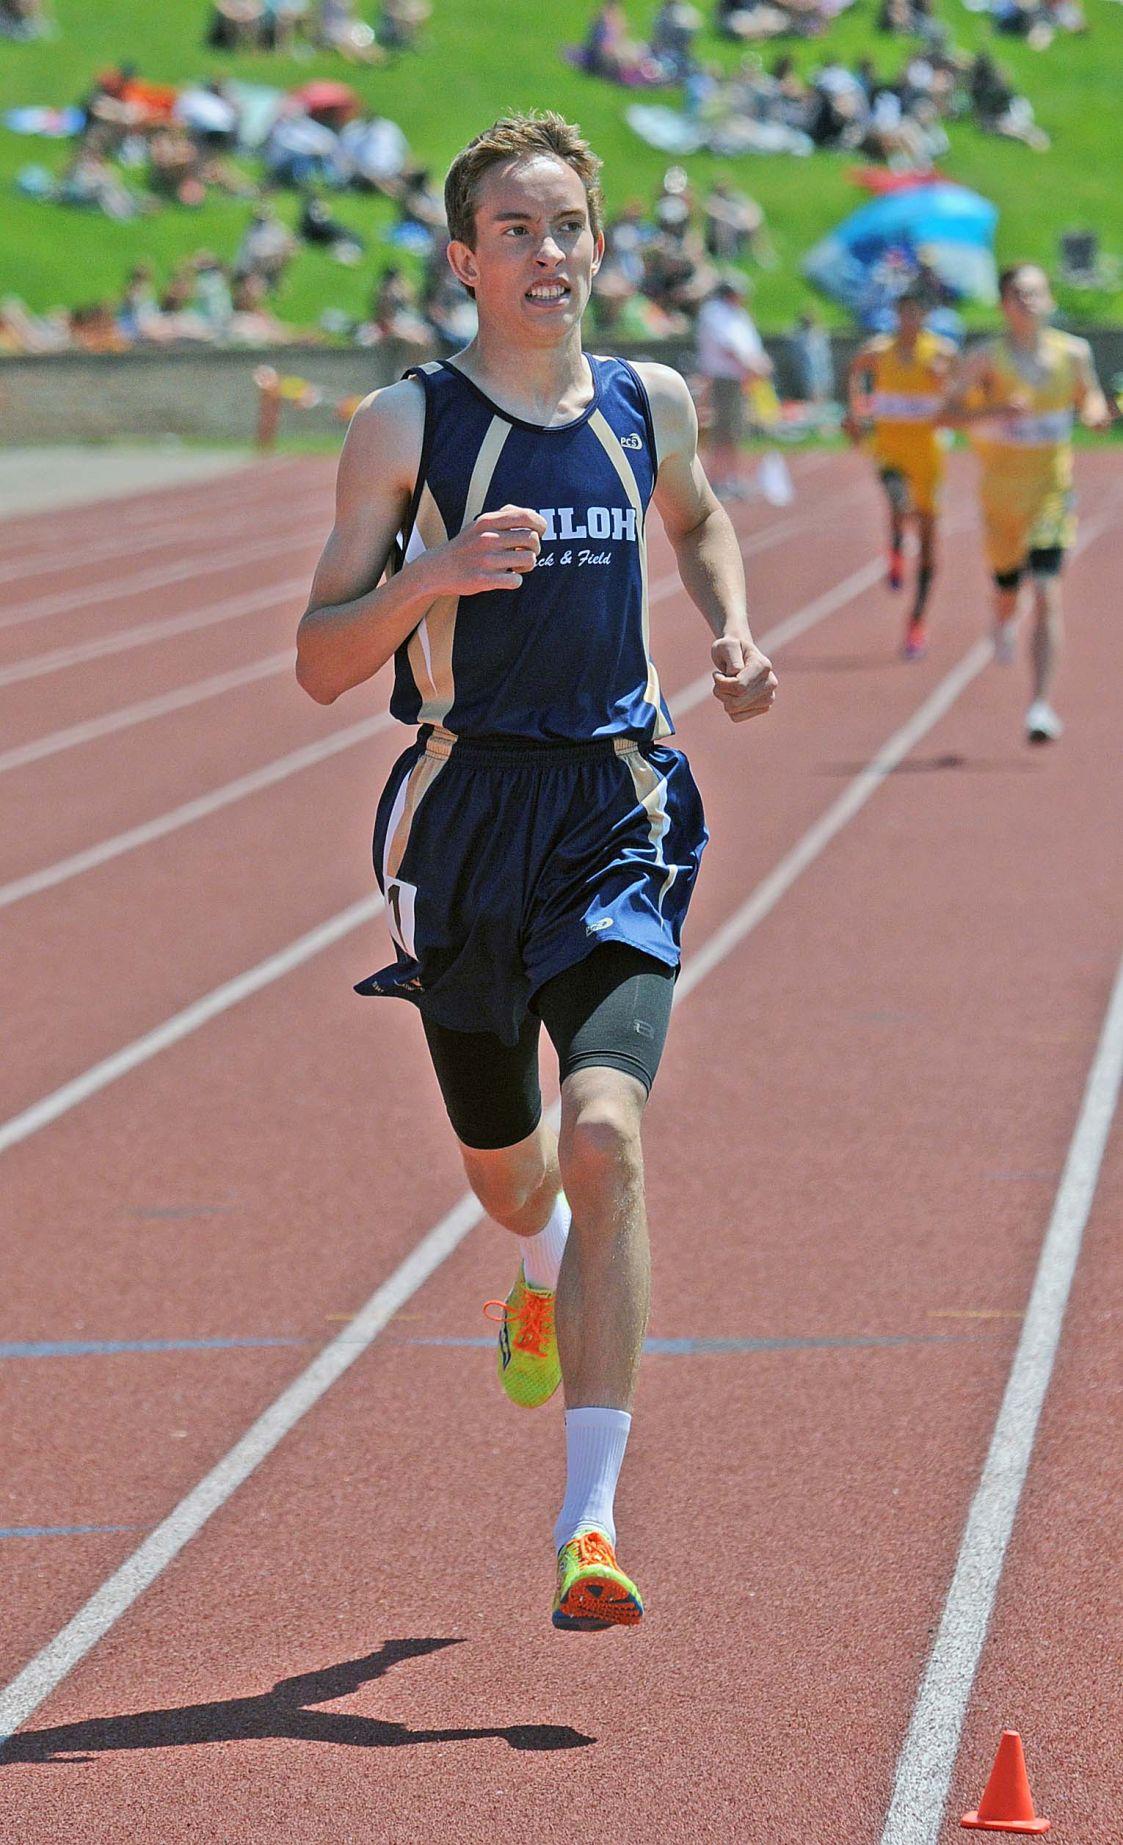 2015 nd state track meet schedule